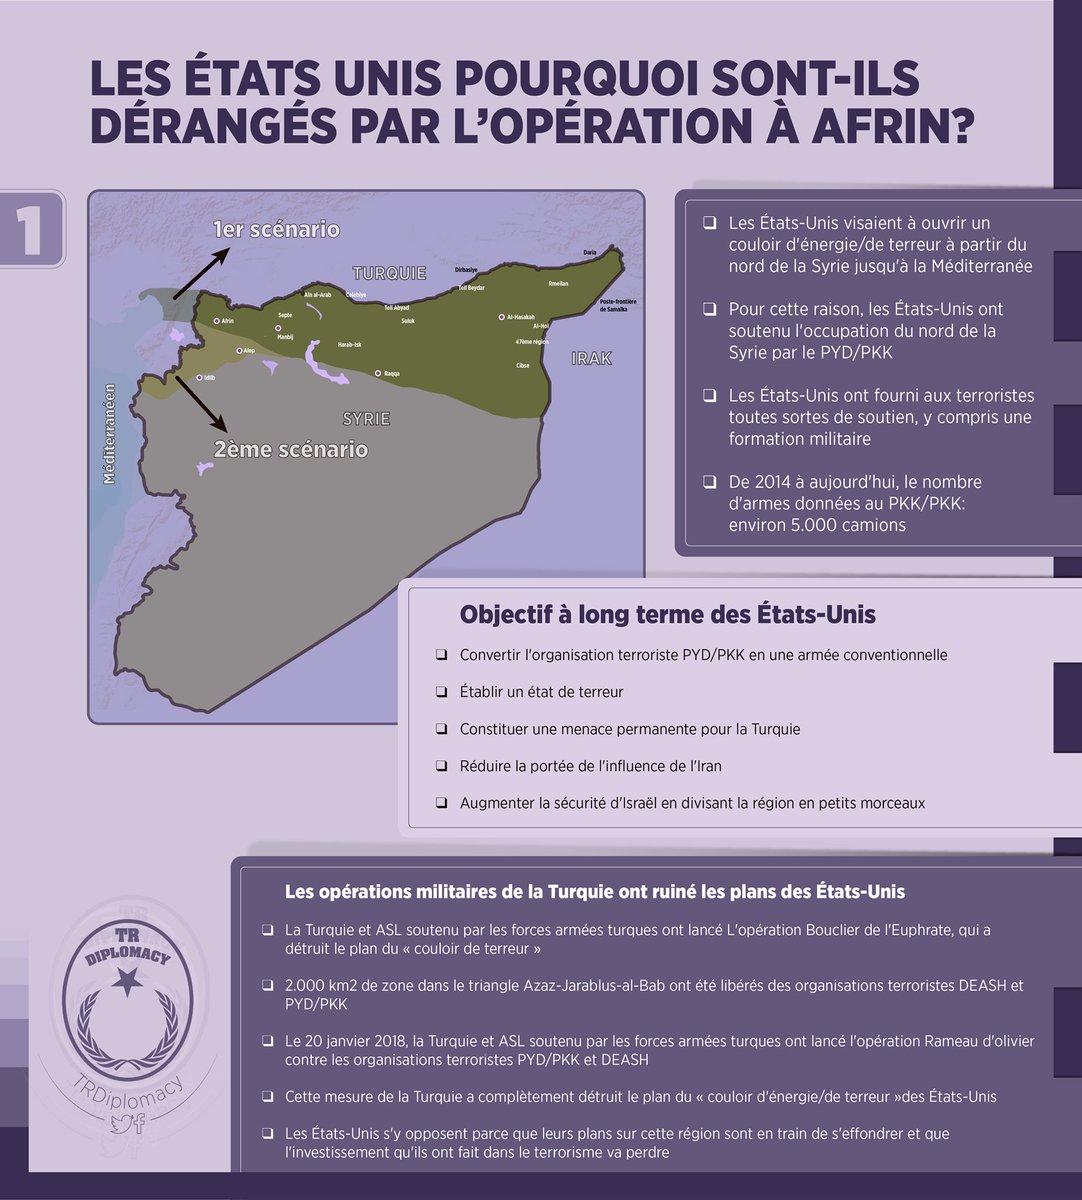 Operationafrin Hashtag On Twitter dedans Nombre De Region